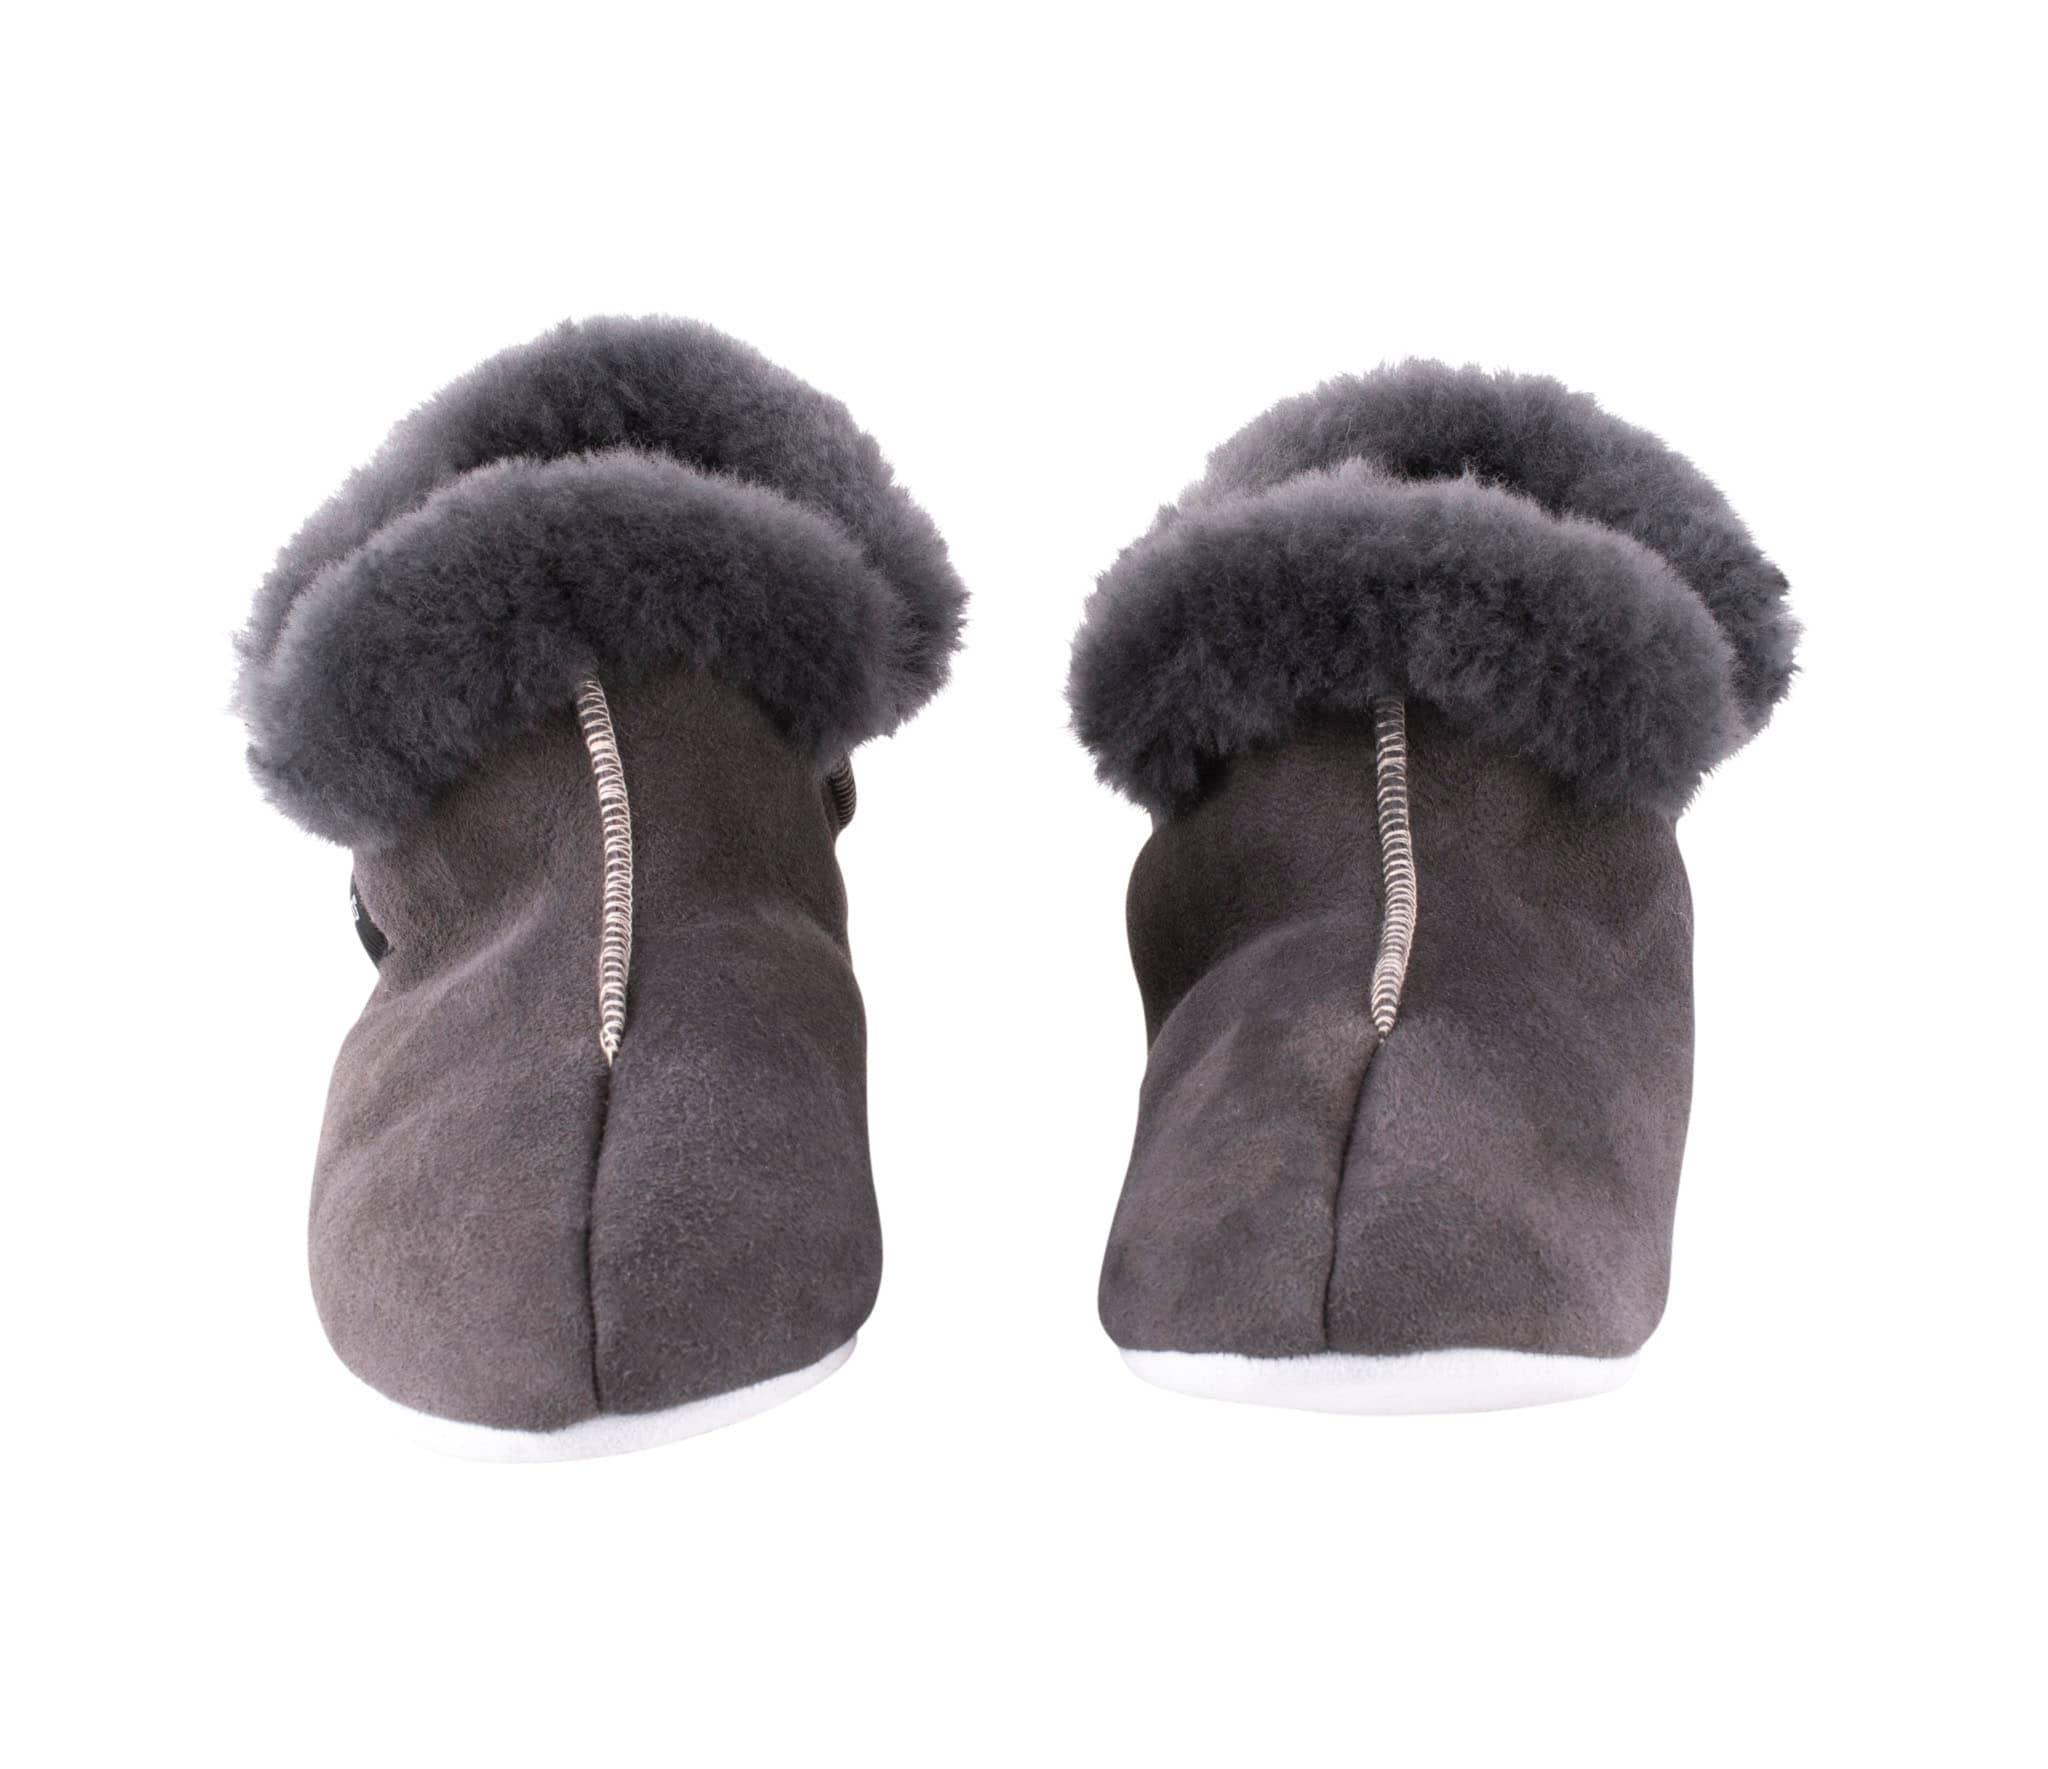 Mariette slippers